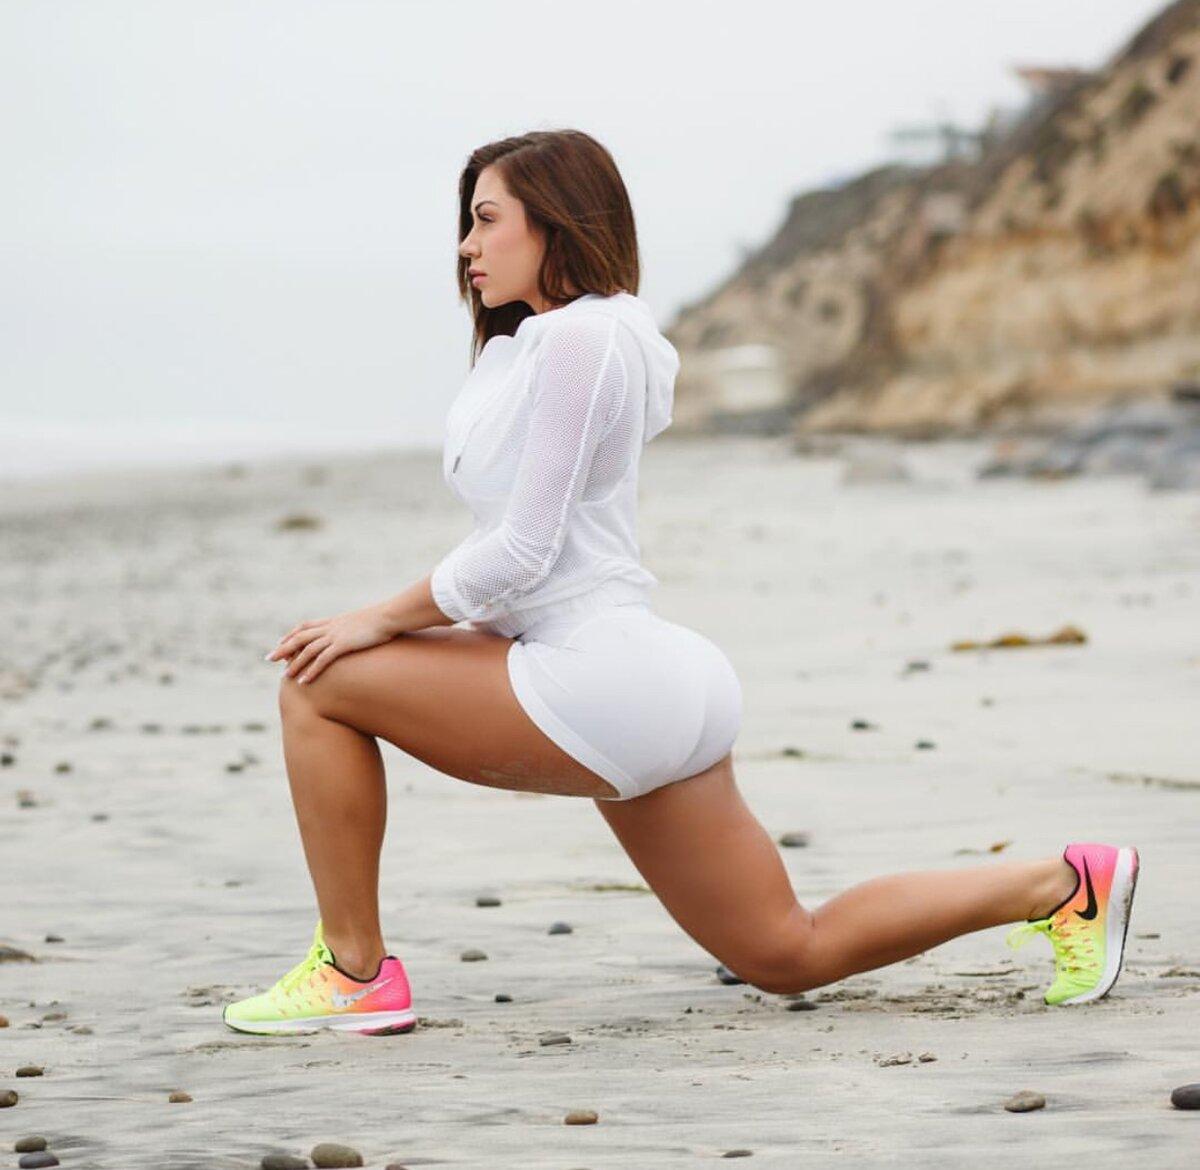 Кейтлин уорд: биография, возраст, вес, рост и фото модели и блогера